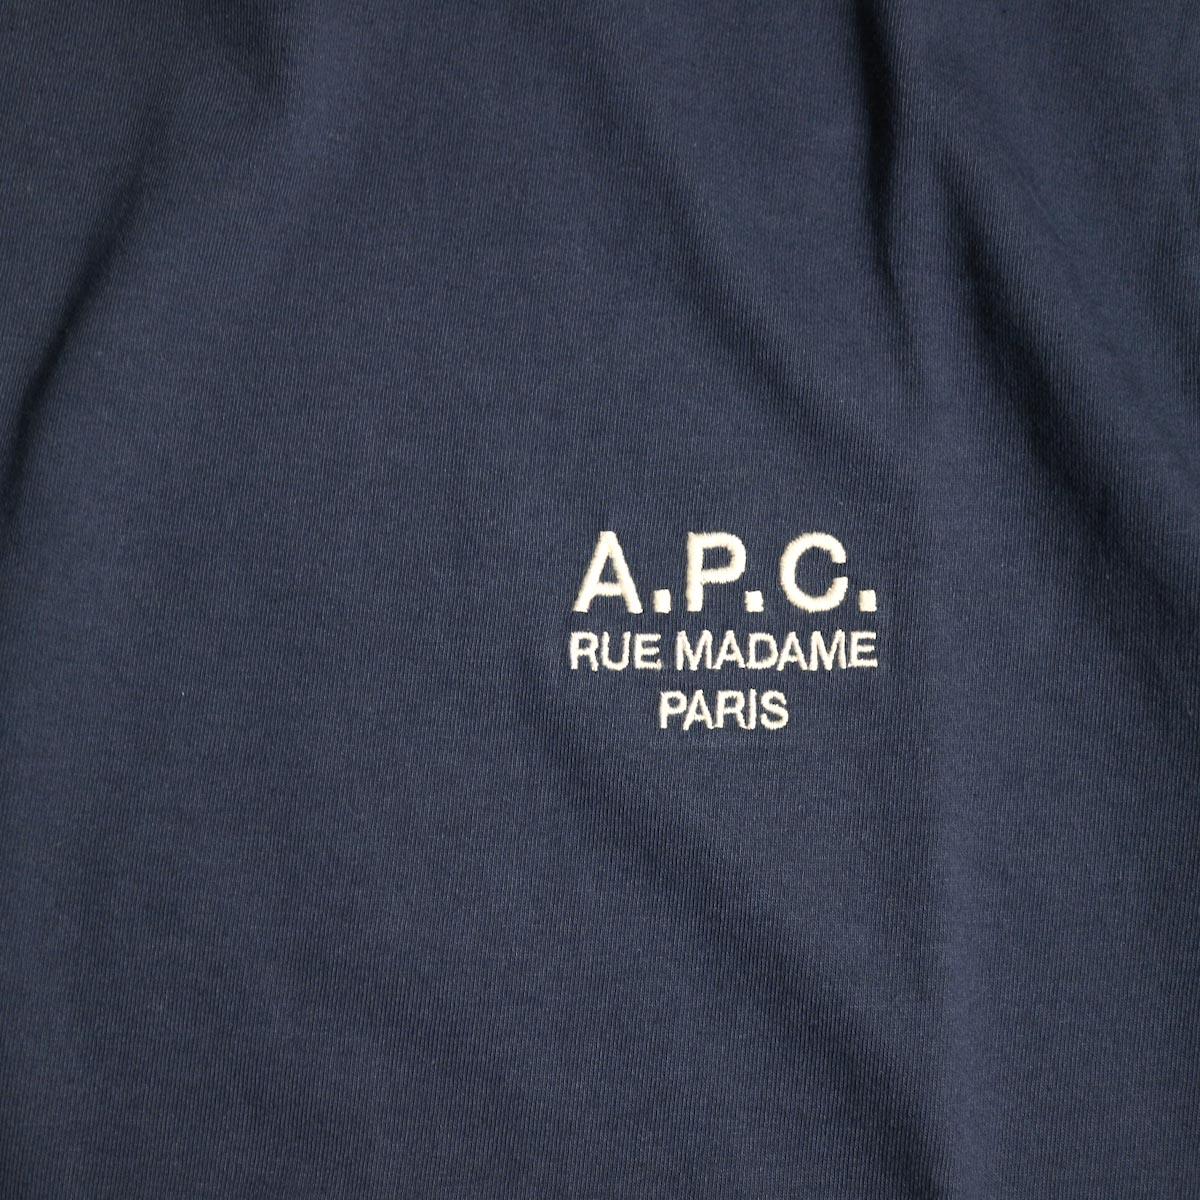 A.P.C. / Crew Neck Tee (Raymond T-shirt) -Navy刺繍